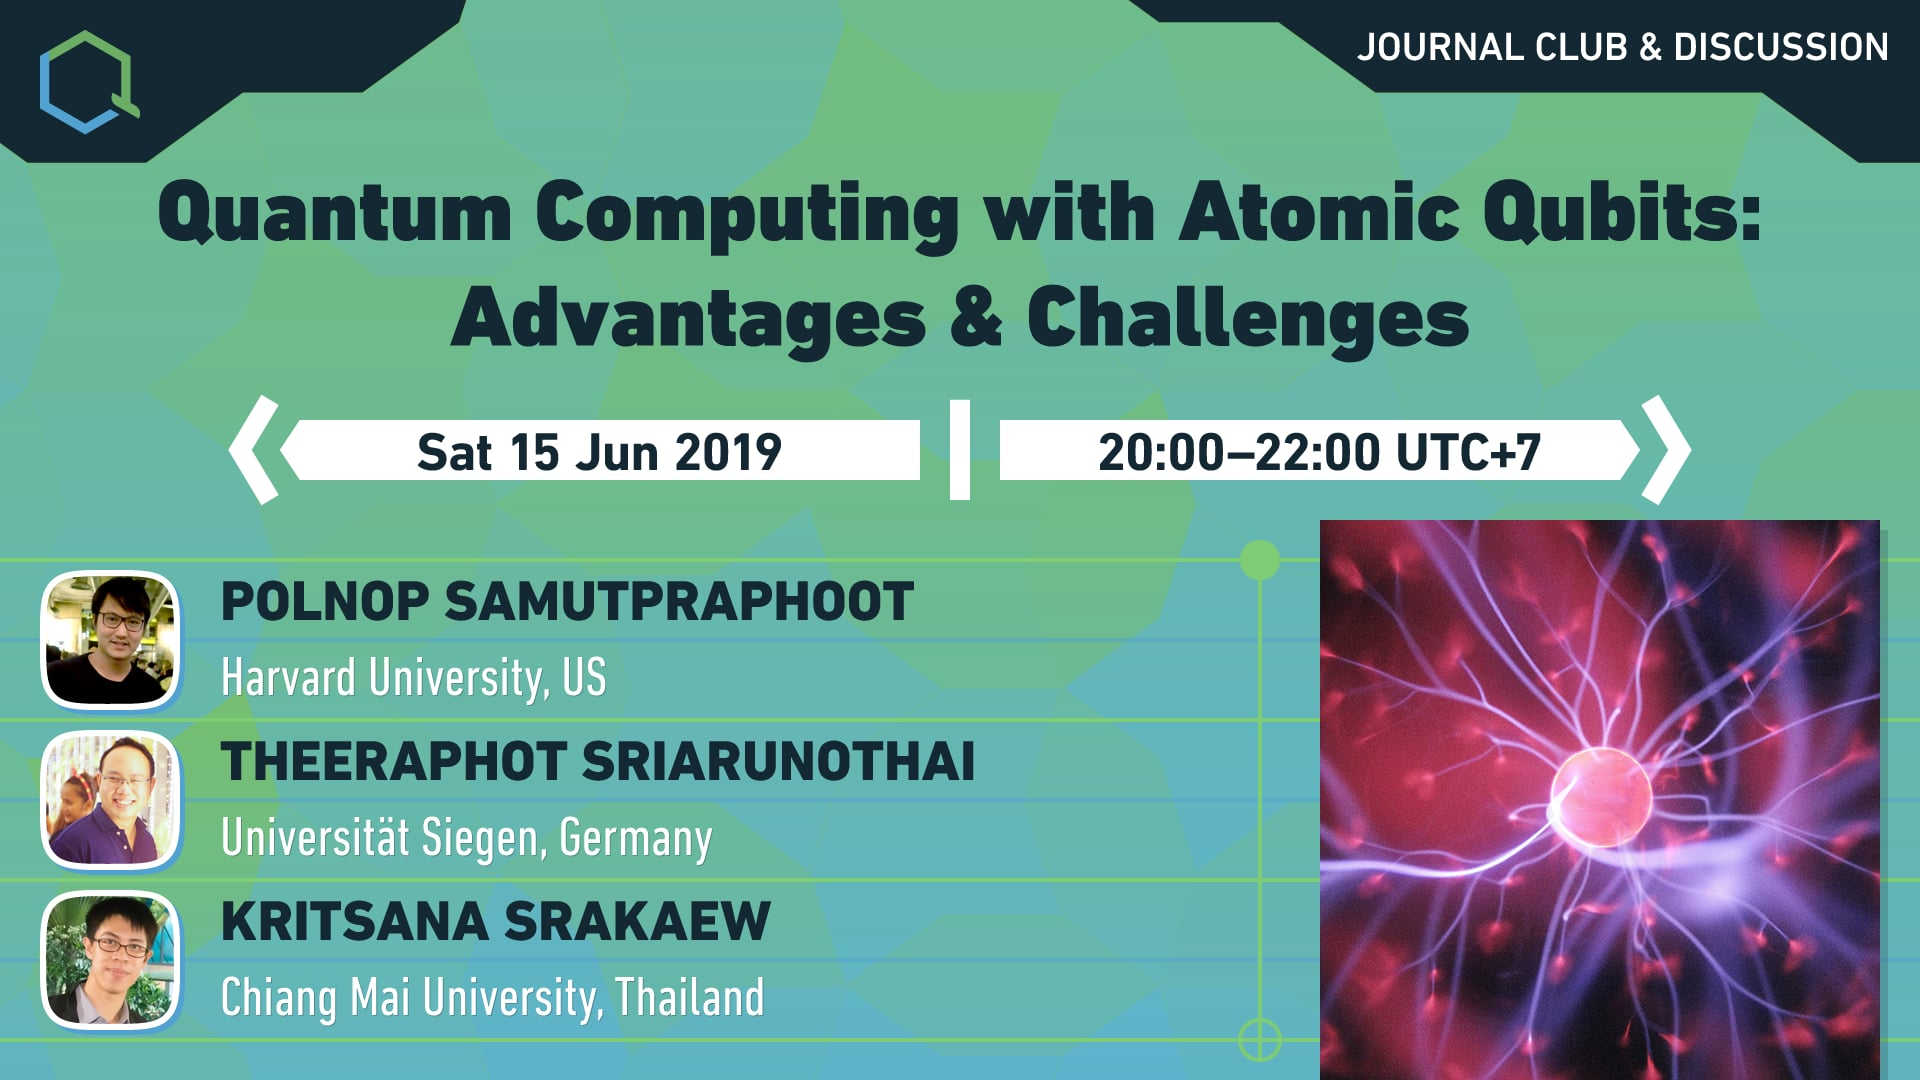 Quantum Computing with Atomic Qubits: Advantages and Challenges